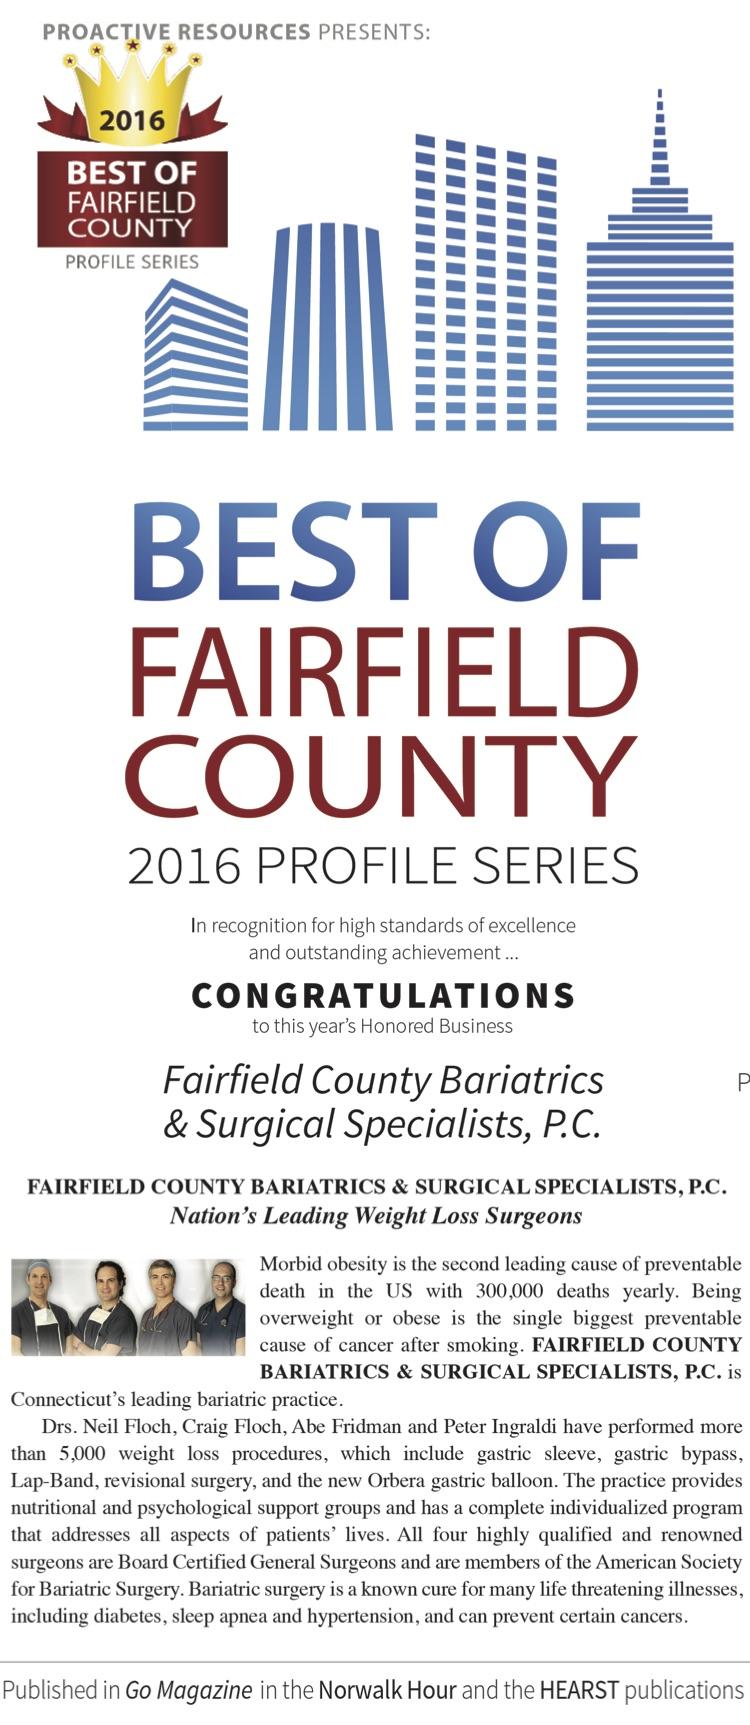 2016 Best Of Fairfield County Profile Series Fairfield County Bariatrics Dr